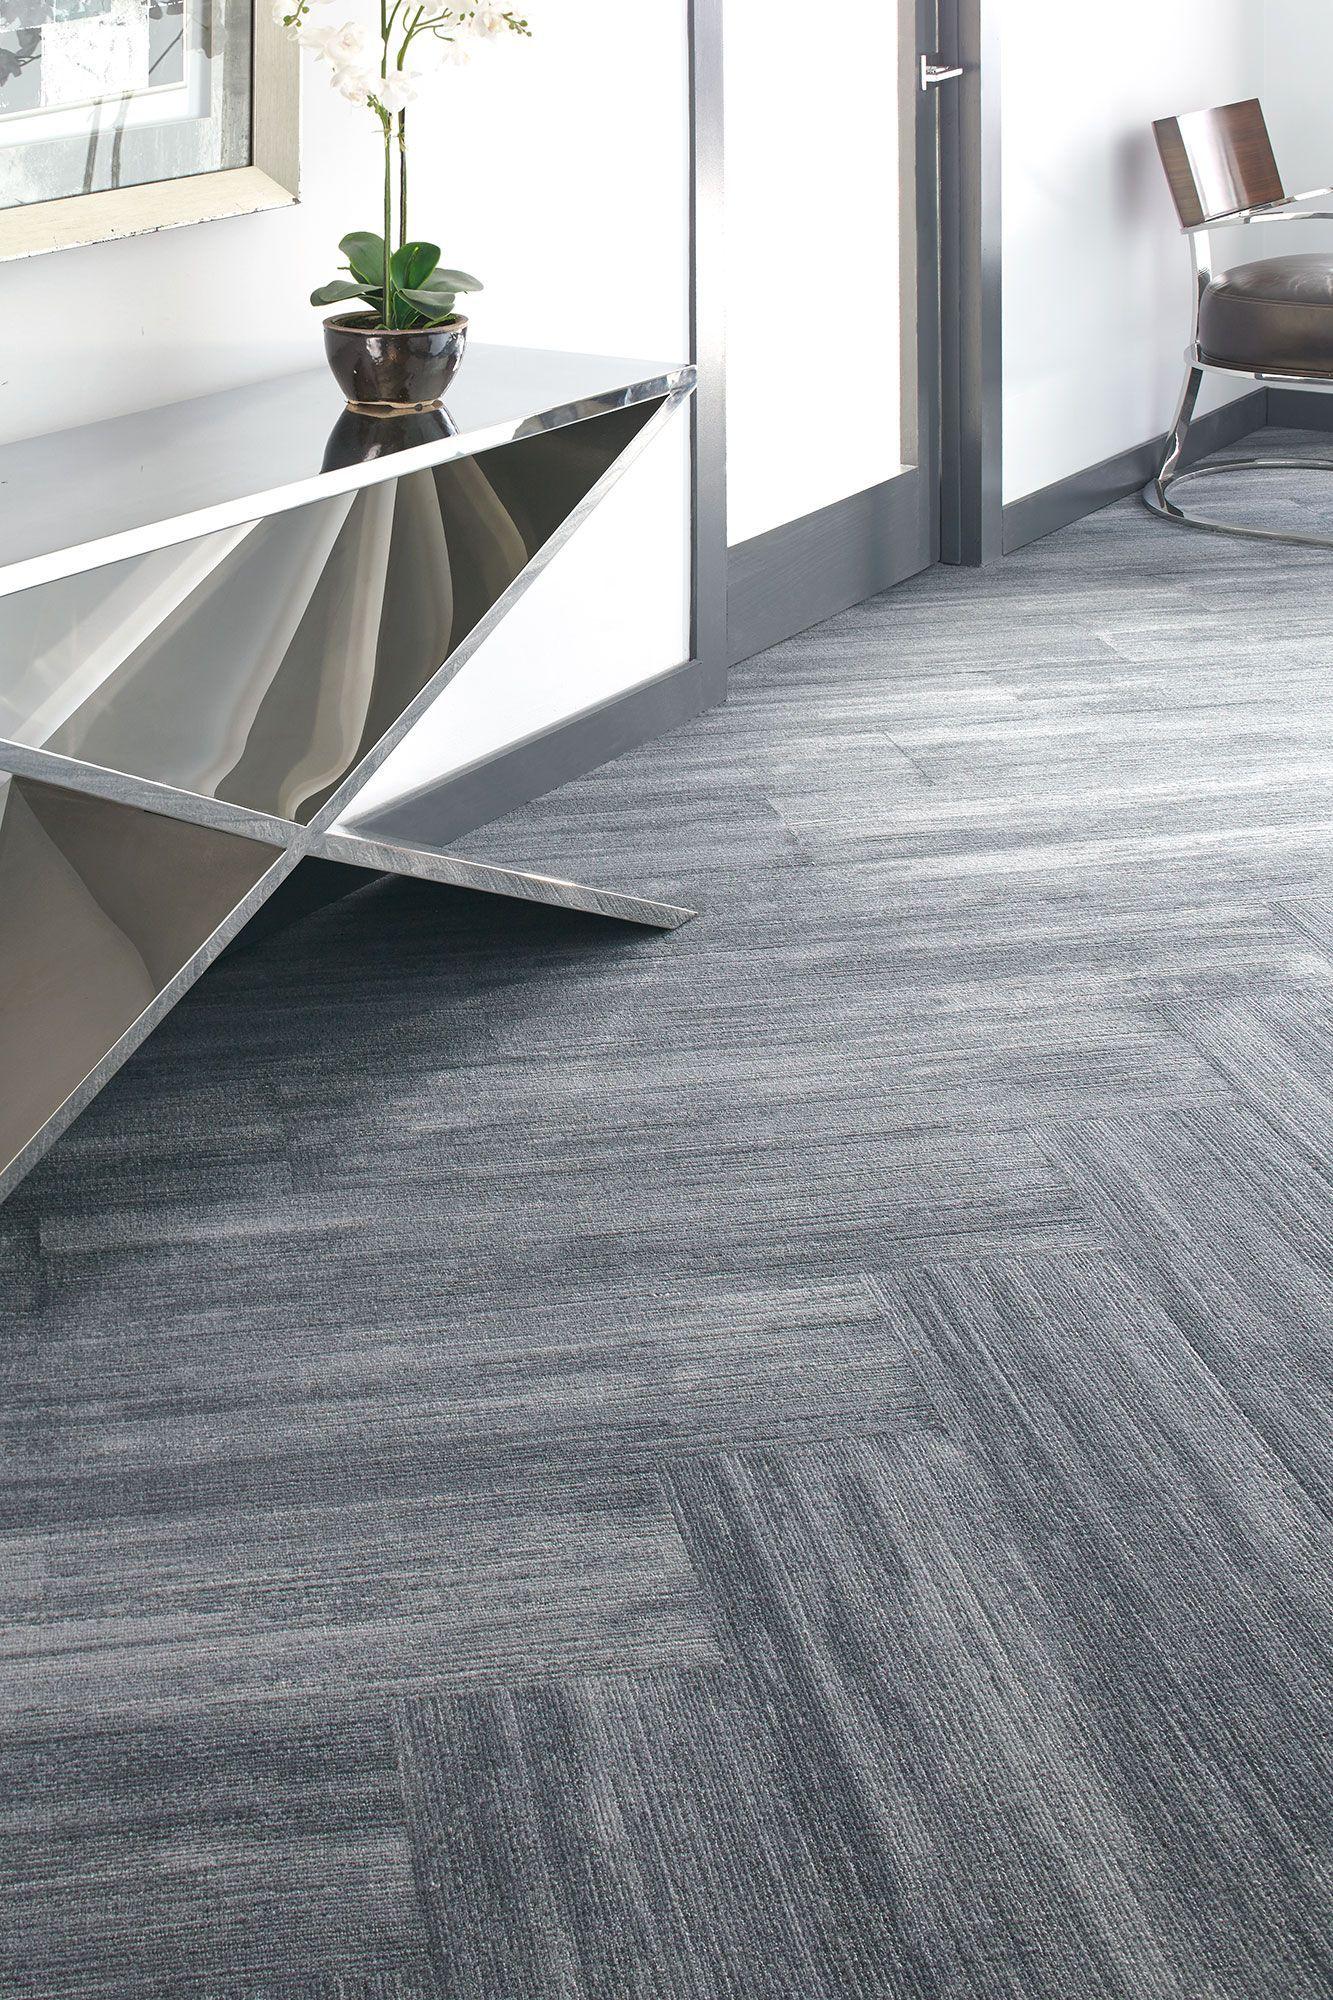 60 Best Carpet Tiles Ideas For Your Dream House Carpet Tiles Office Carpet Tiles Design Carpet Tiles